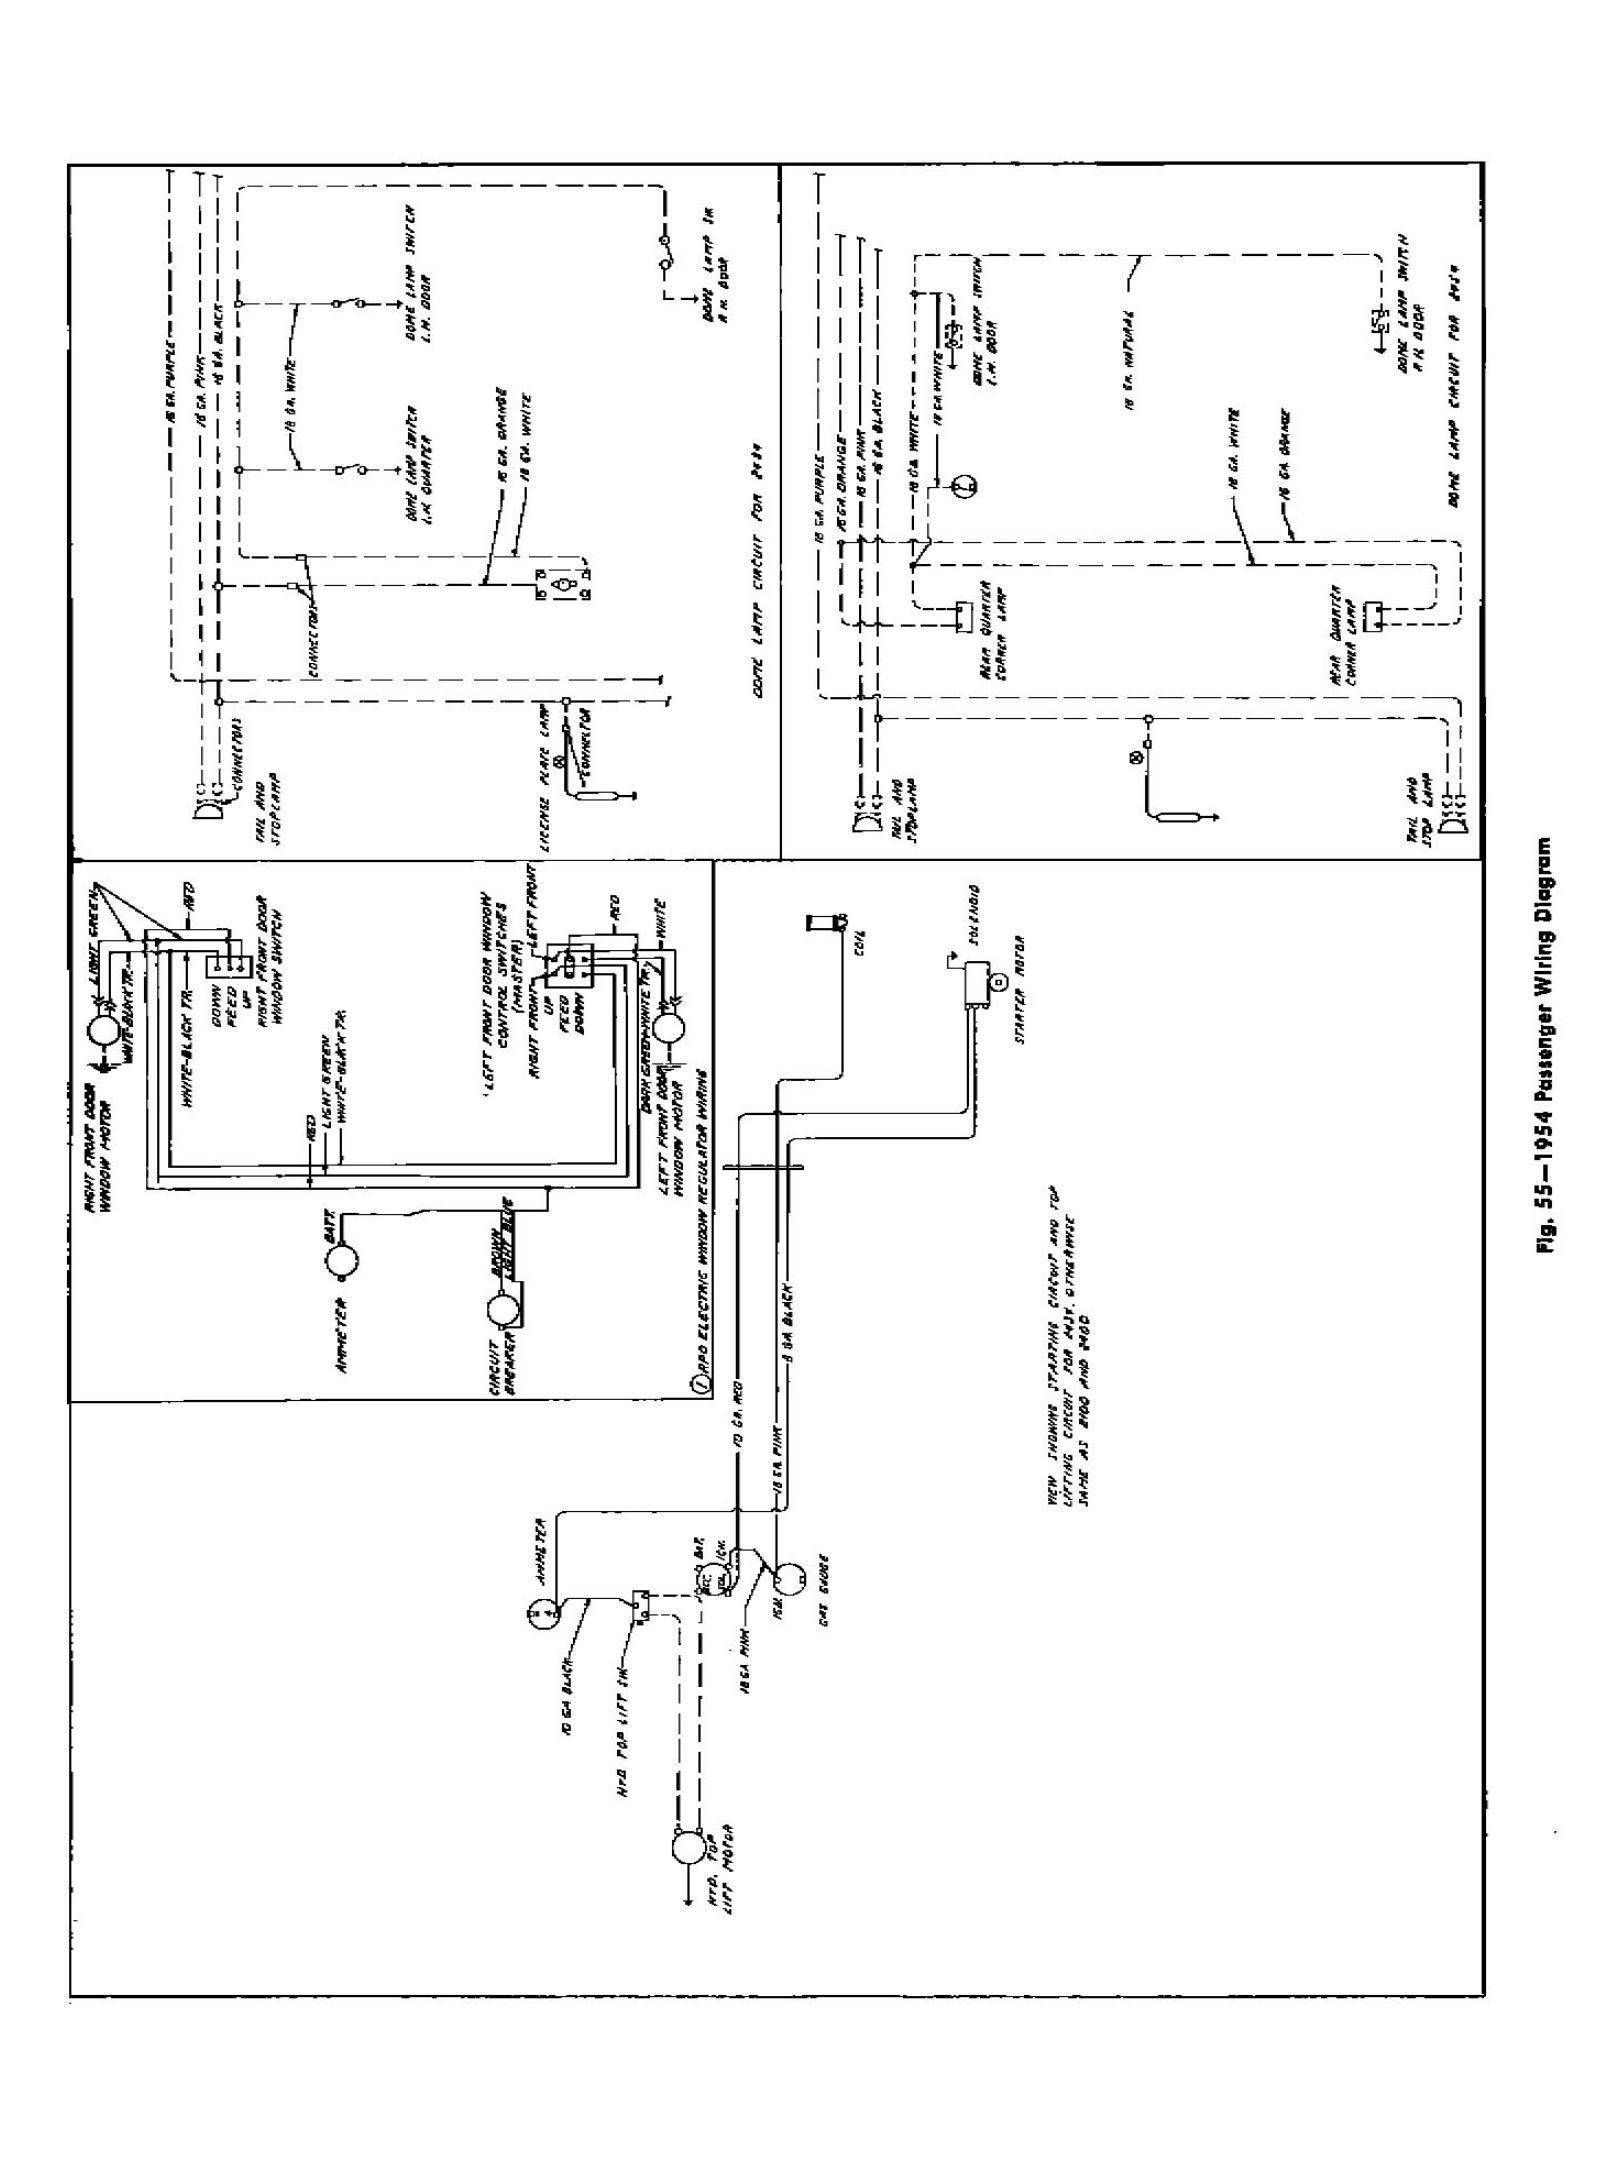 Ford Volt Gauge Wiring Diagram Wire Schematic Voltmeter 8n 1 Alternator Diagrams Fuse Box Vdo Tachometer